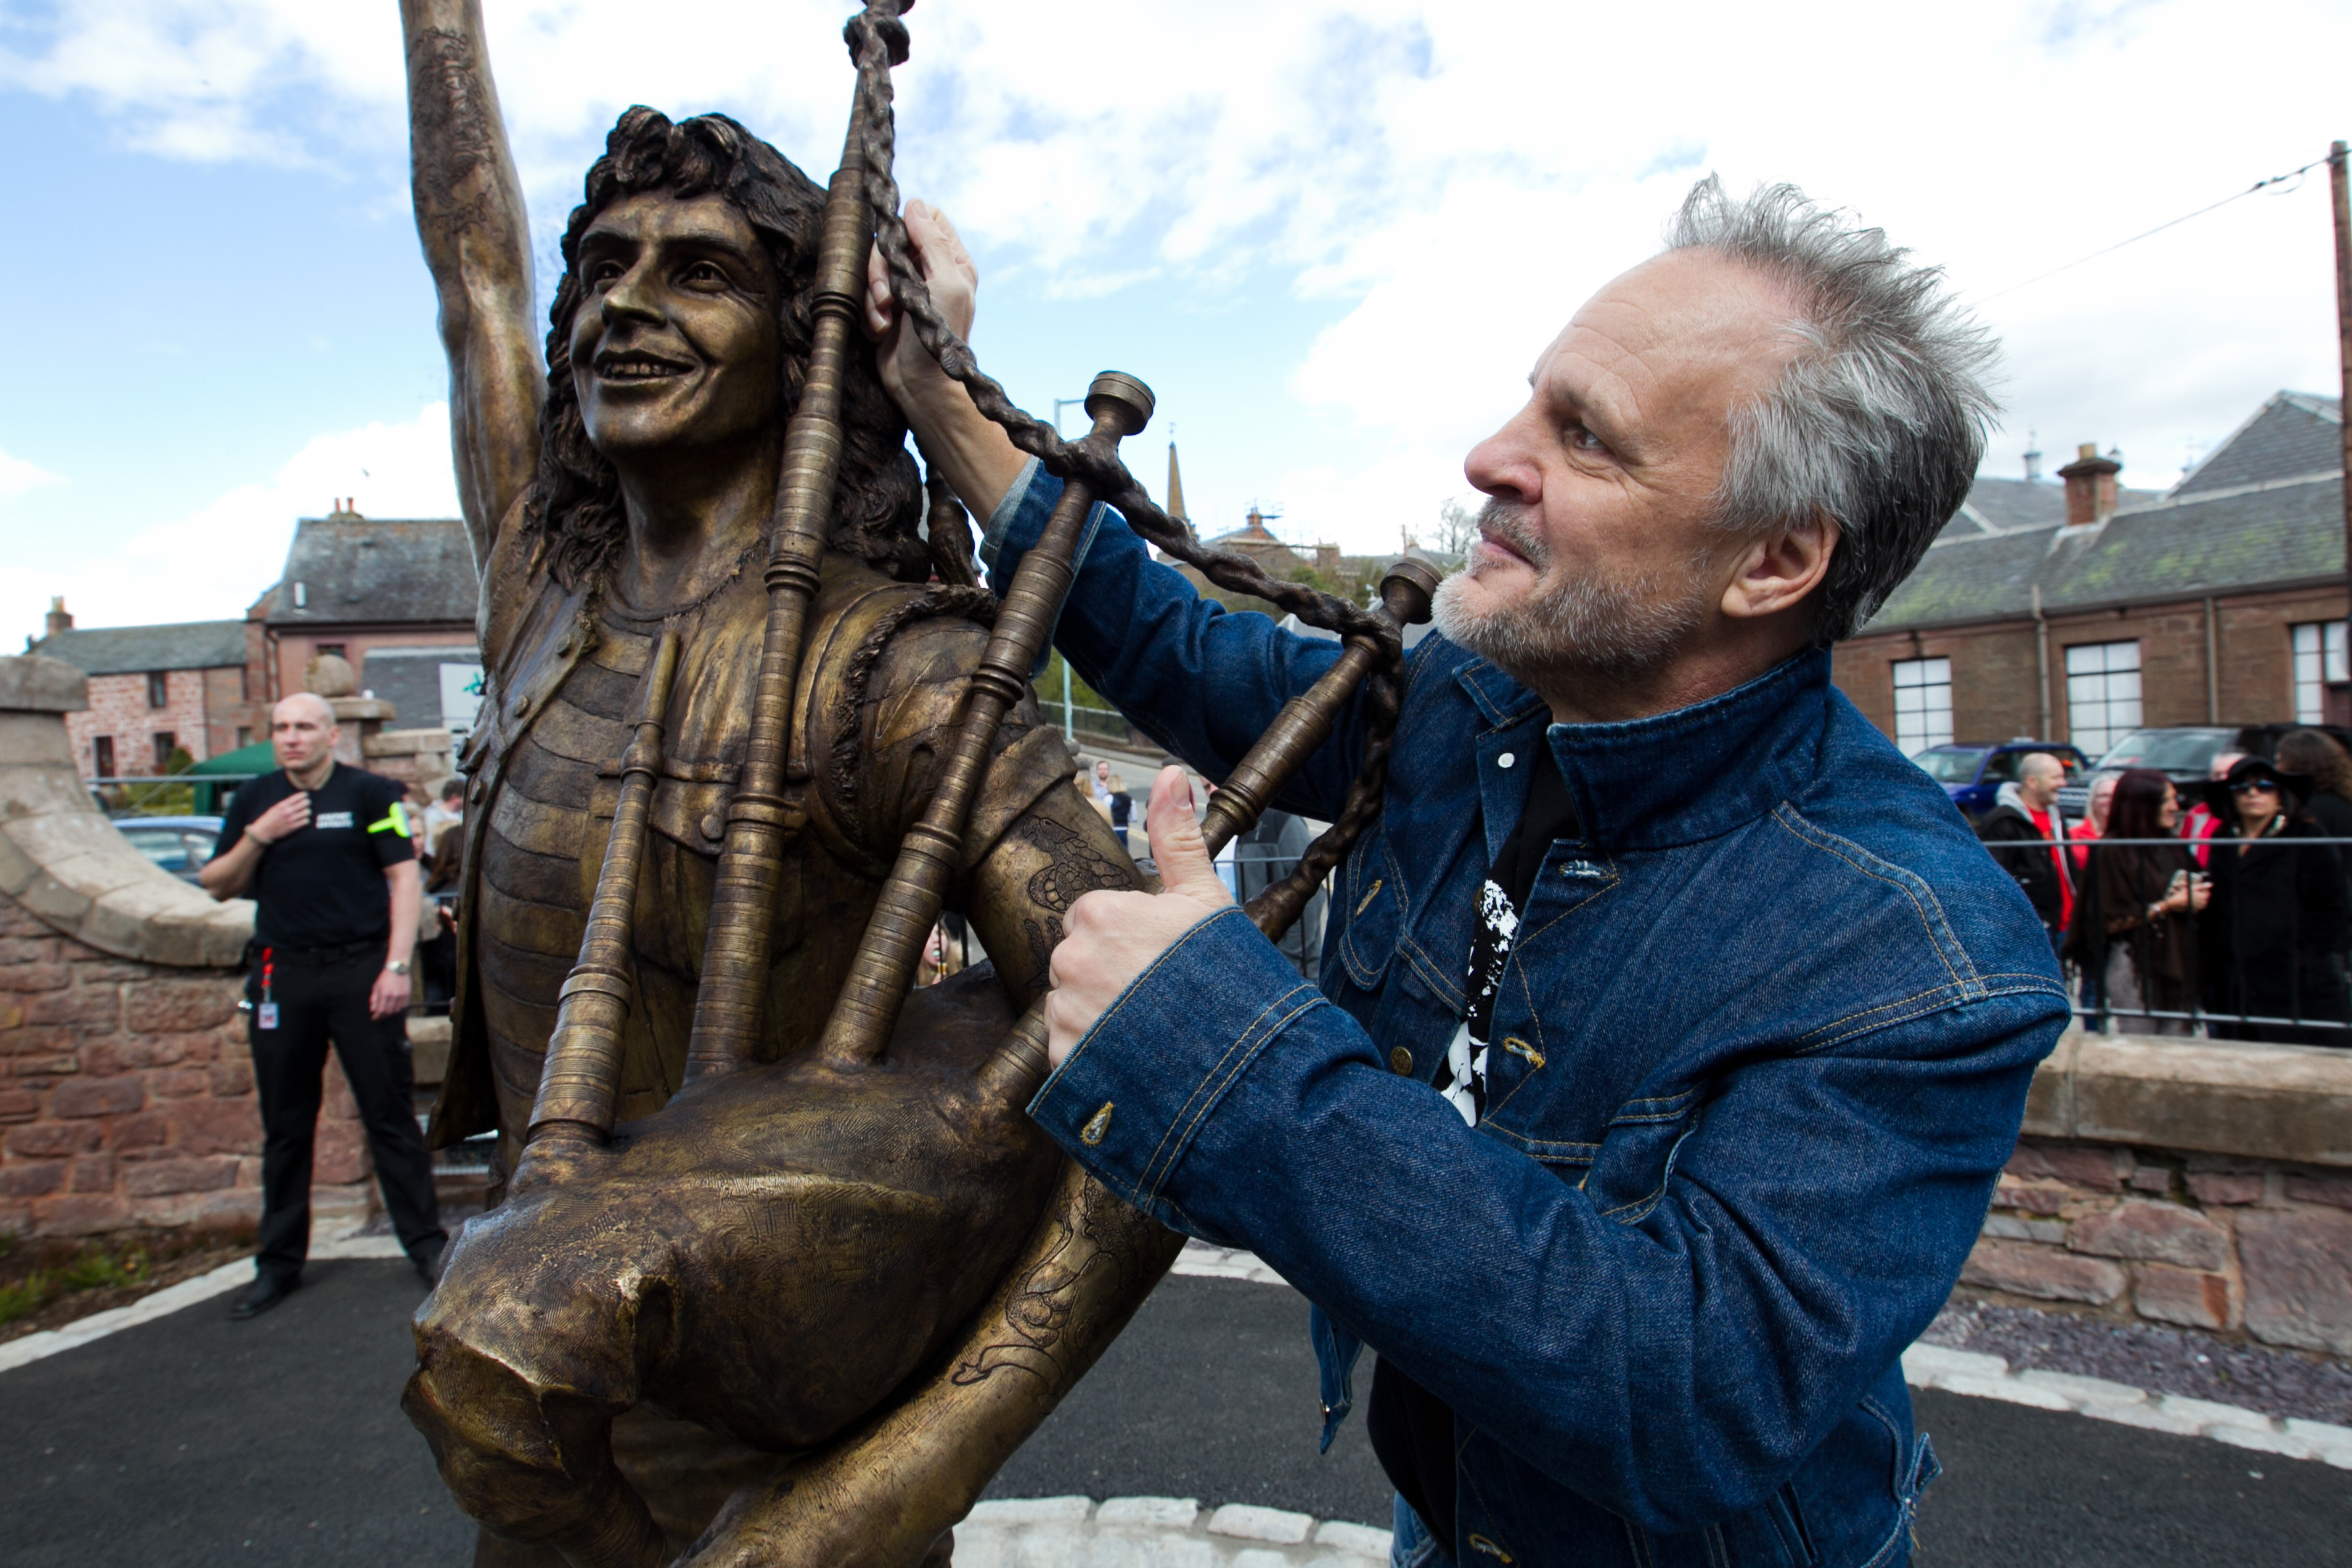 Former AC/DC bassist Mark Evans at the Bon Scott statue in Kirriemuir two years ago.